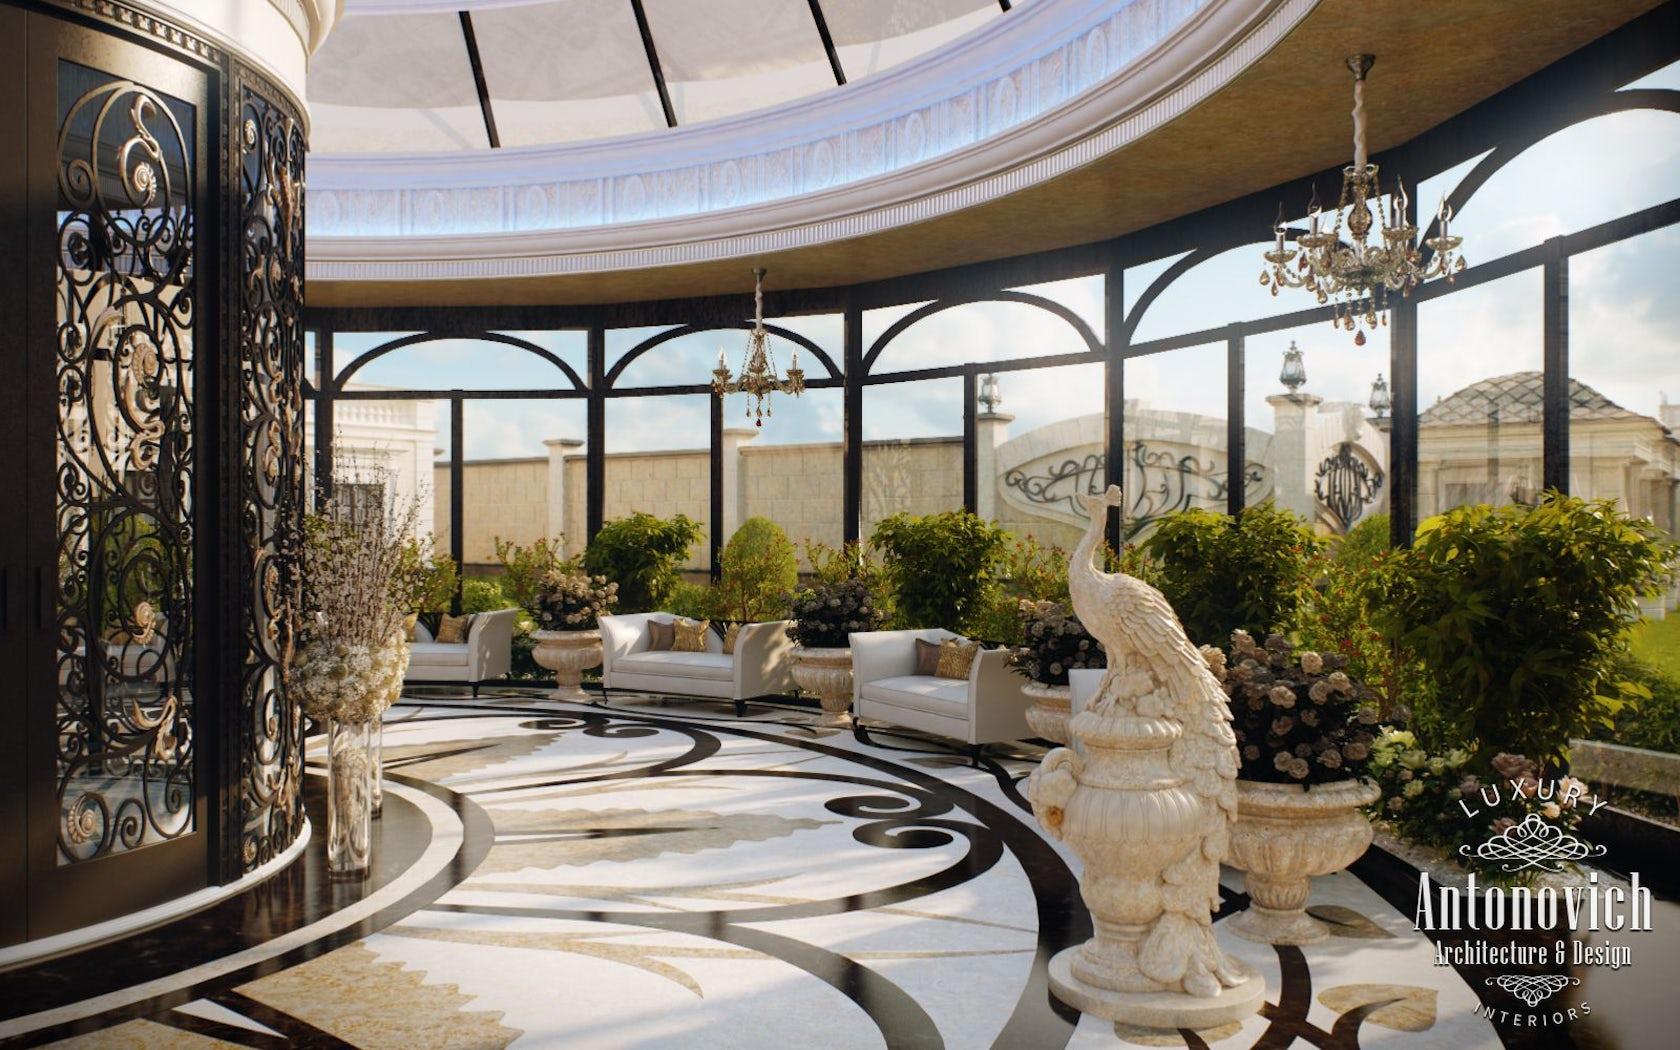 Landscape design dubai from luxury antonovich design for Garden design dubai